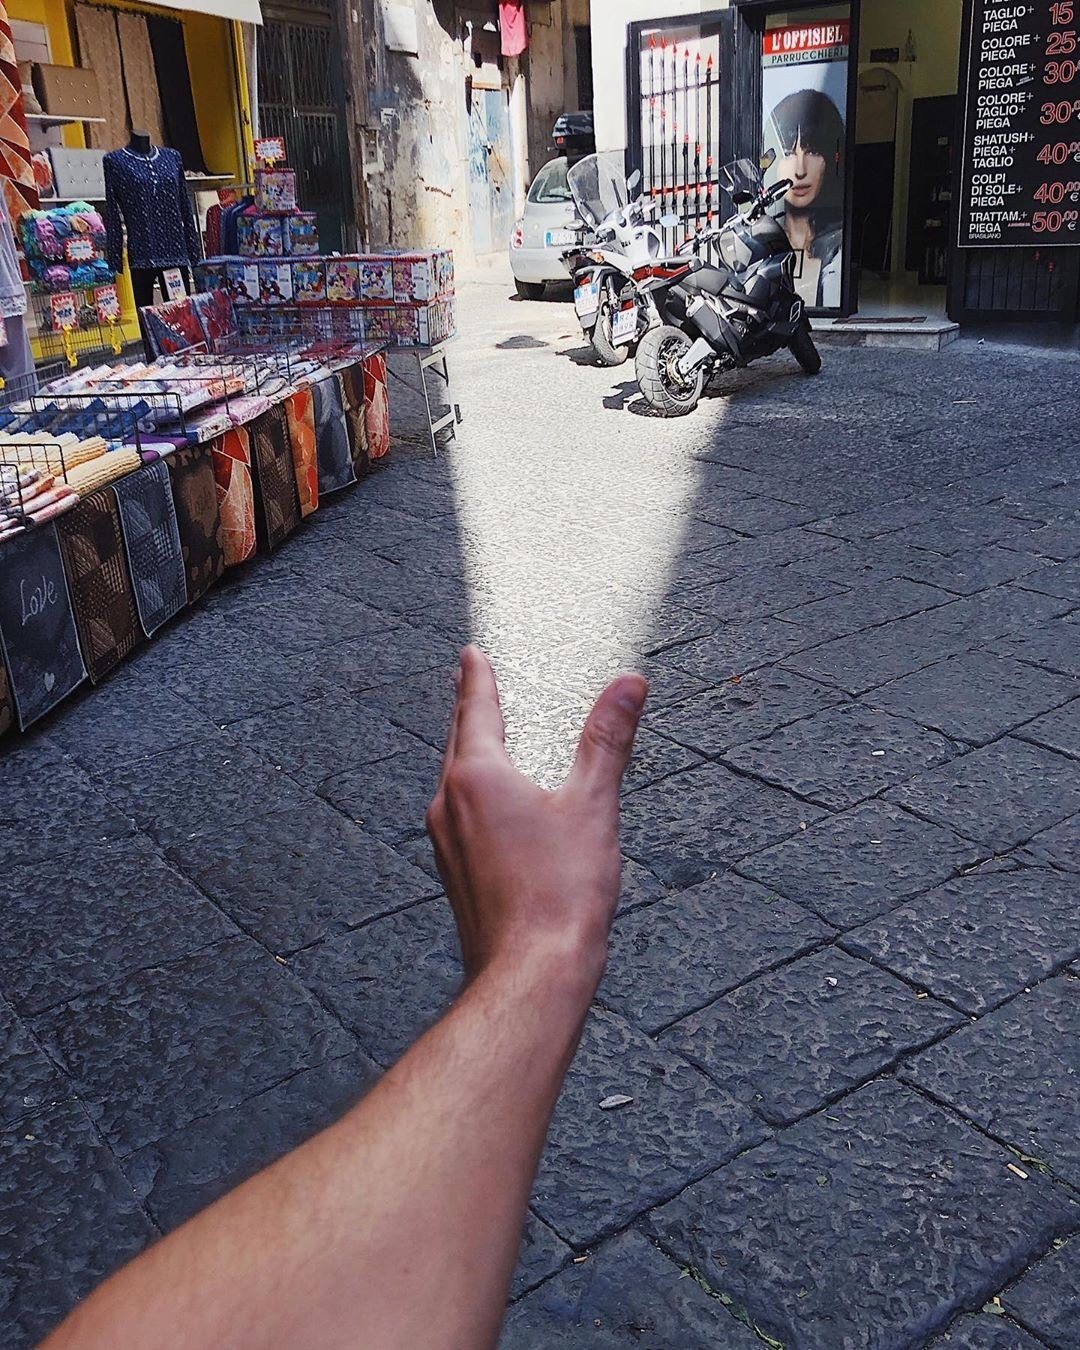 «Человеческий фонарик». Неаполь, Италия. Автор Тиаго Силва